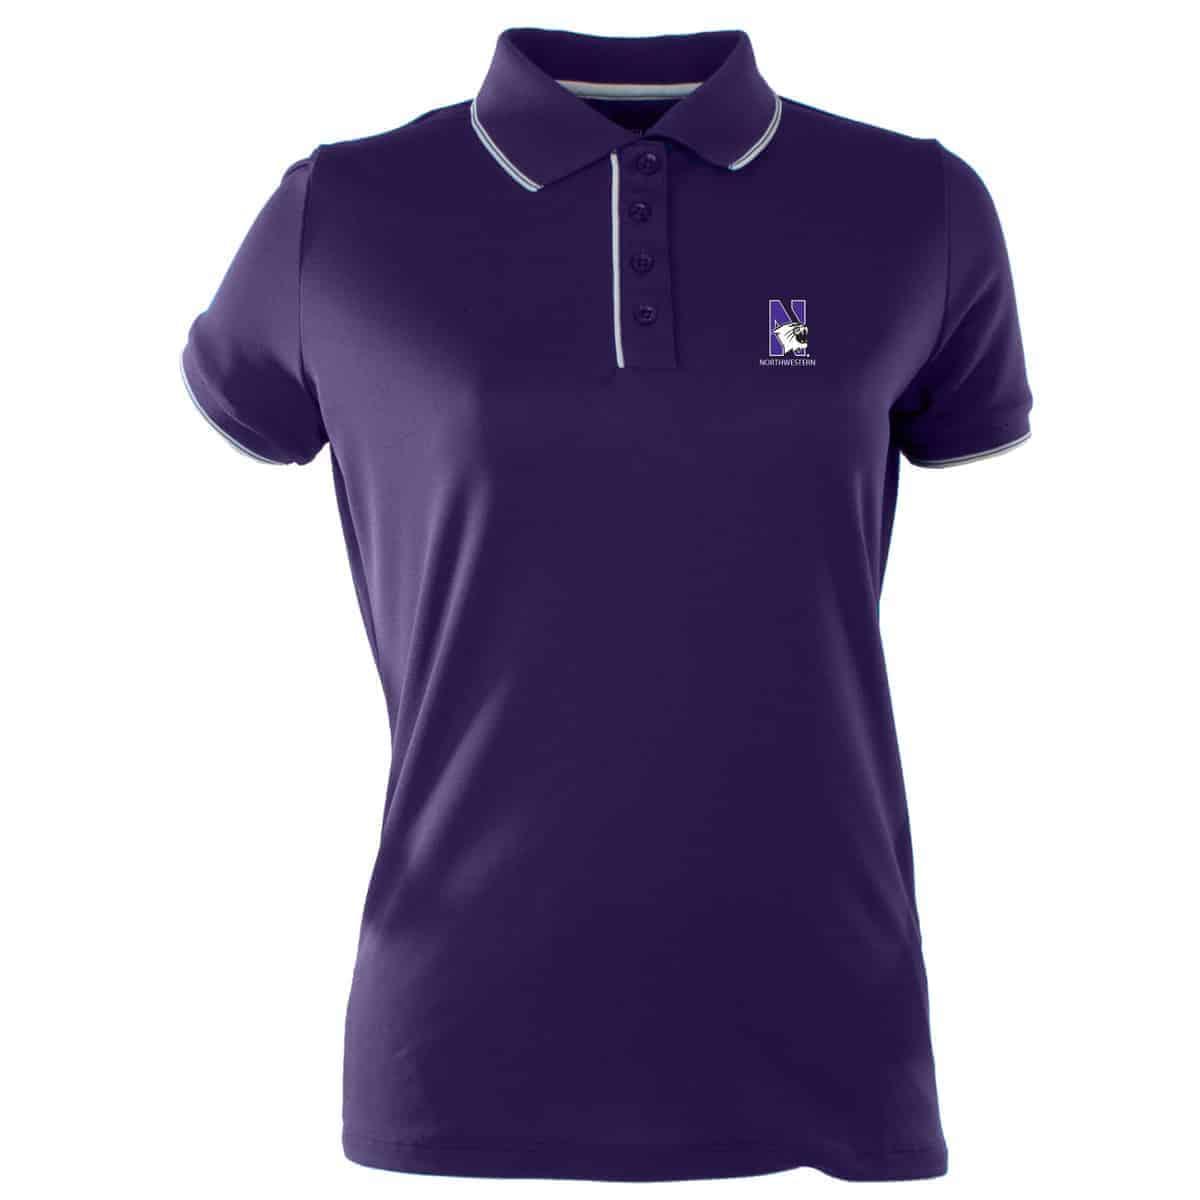 095d4906 Northwestern Widcats Antigua Women's Purple Polo Shirt Women's Elite 100549